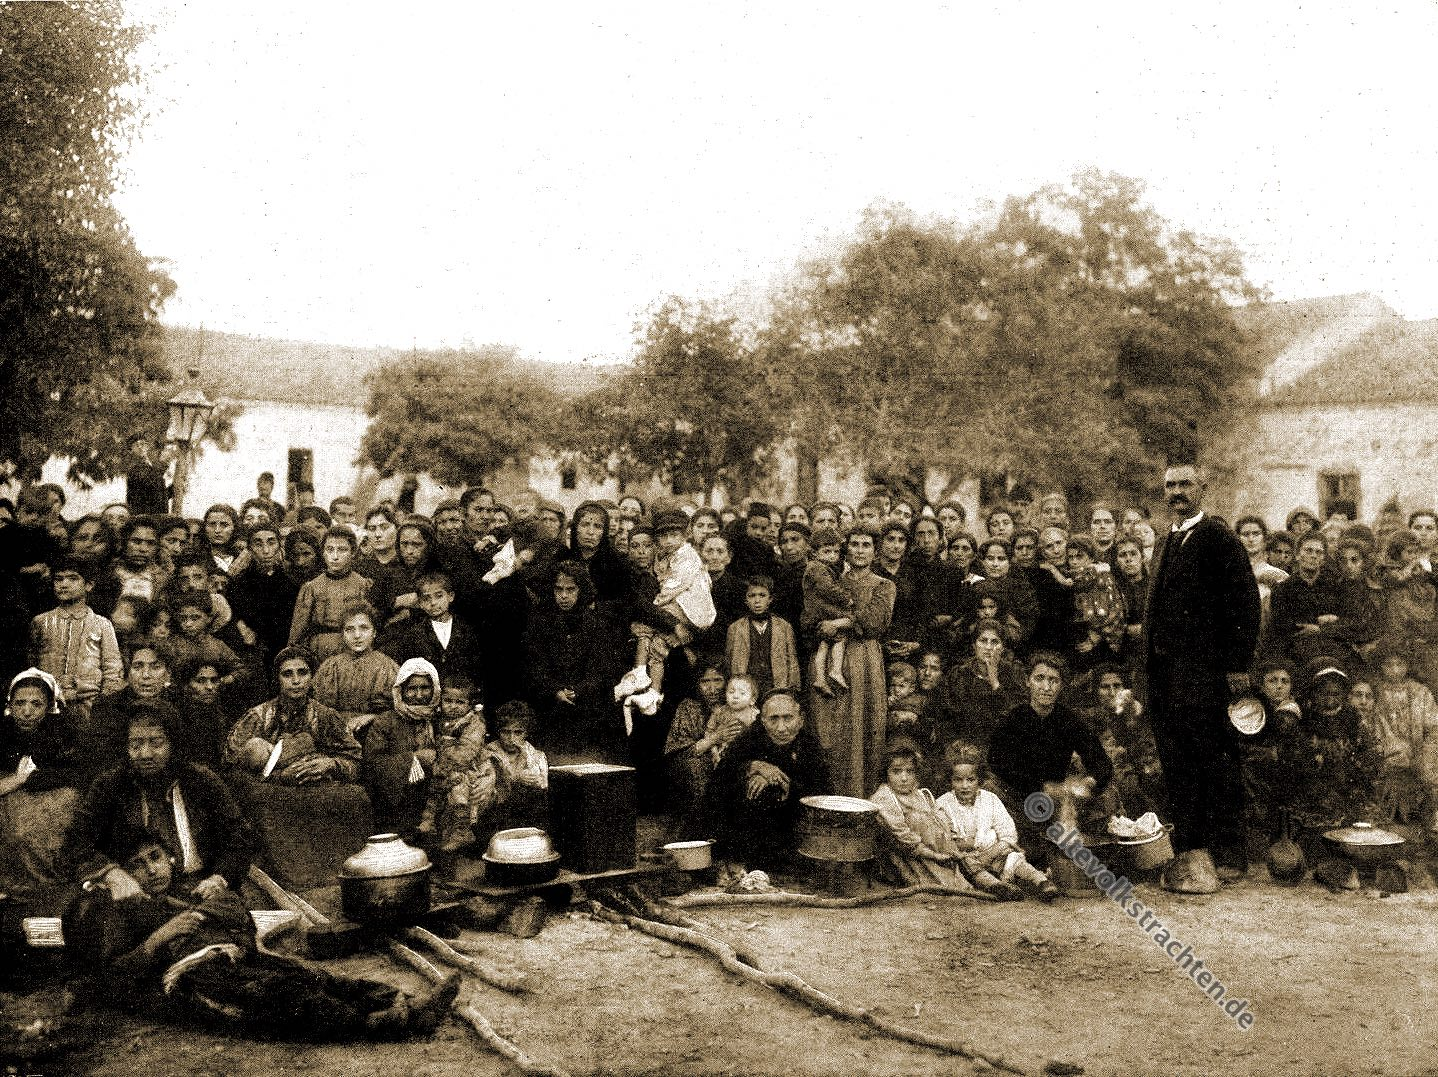 Armenien, Flüchtlinge, Warna, Bulgarien, Marquis Dufferin Ava, Genozid, Völkermord